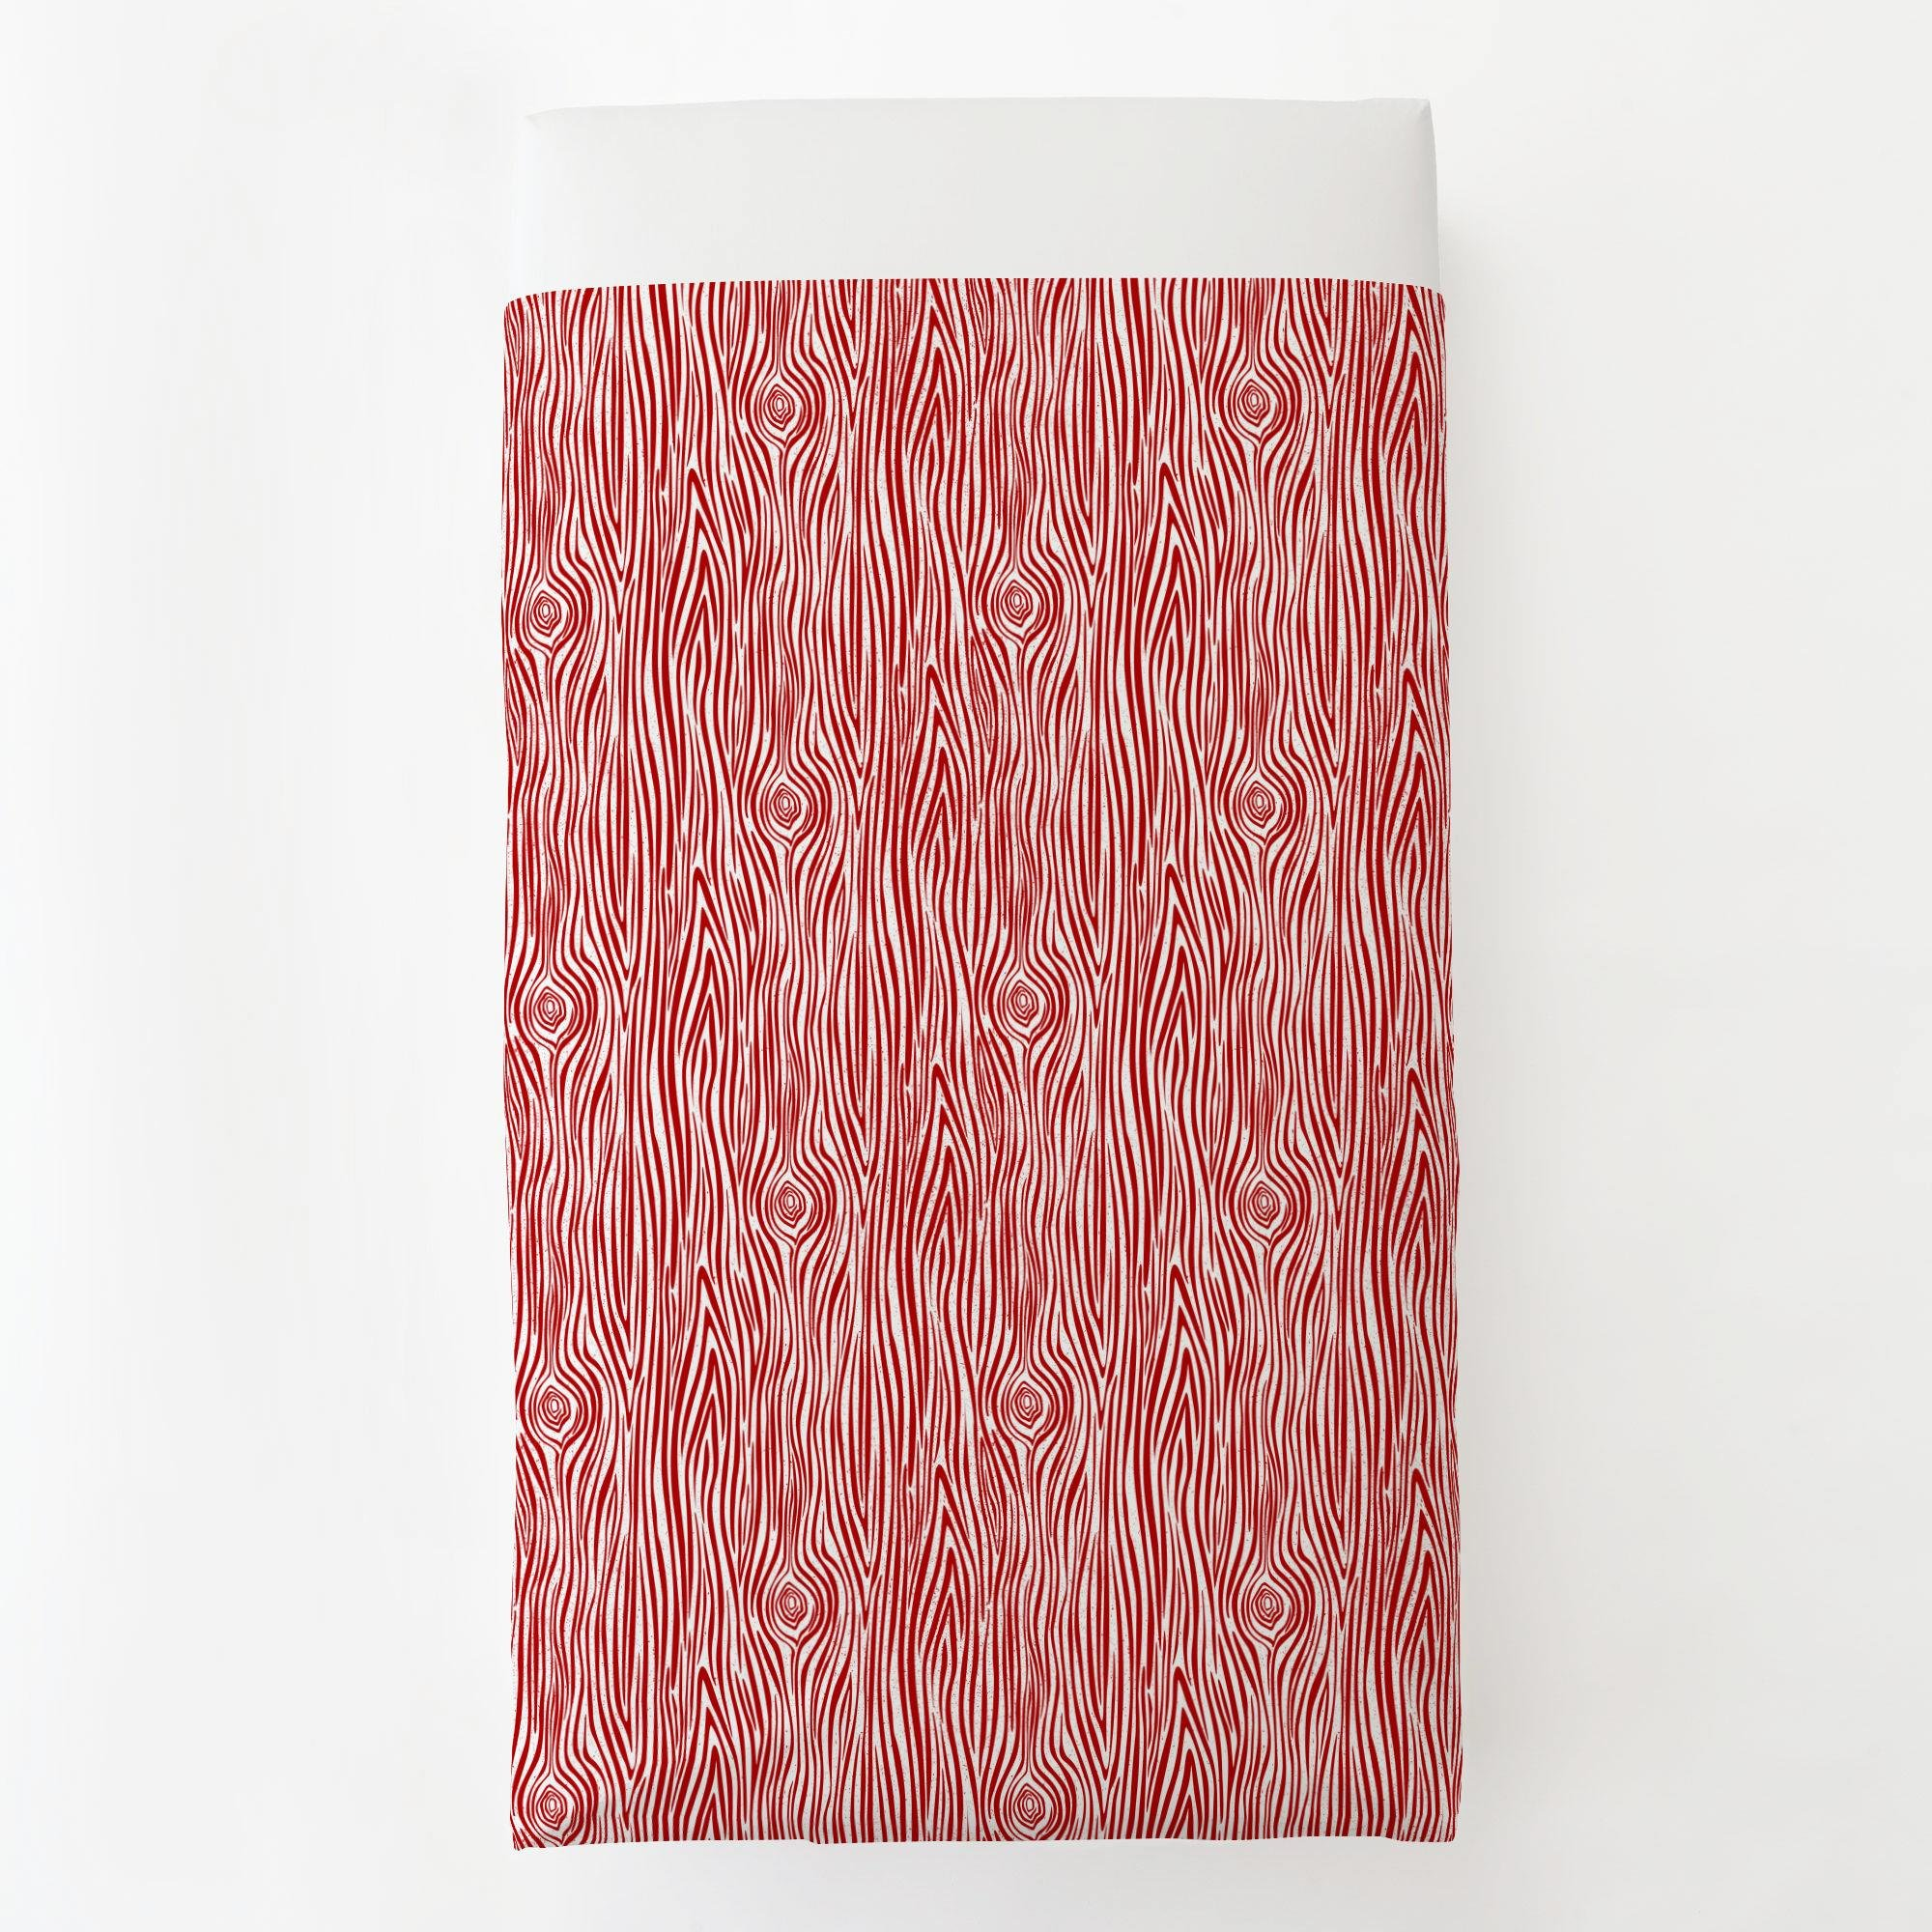 Carousel Designs Red Woodgrain Toddler Bed Sheet Top Flat by Carousel Designs (Image #2)